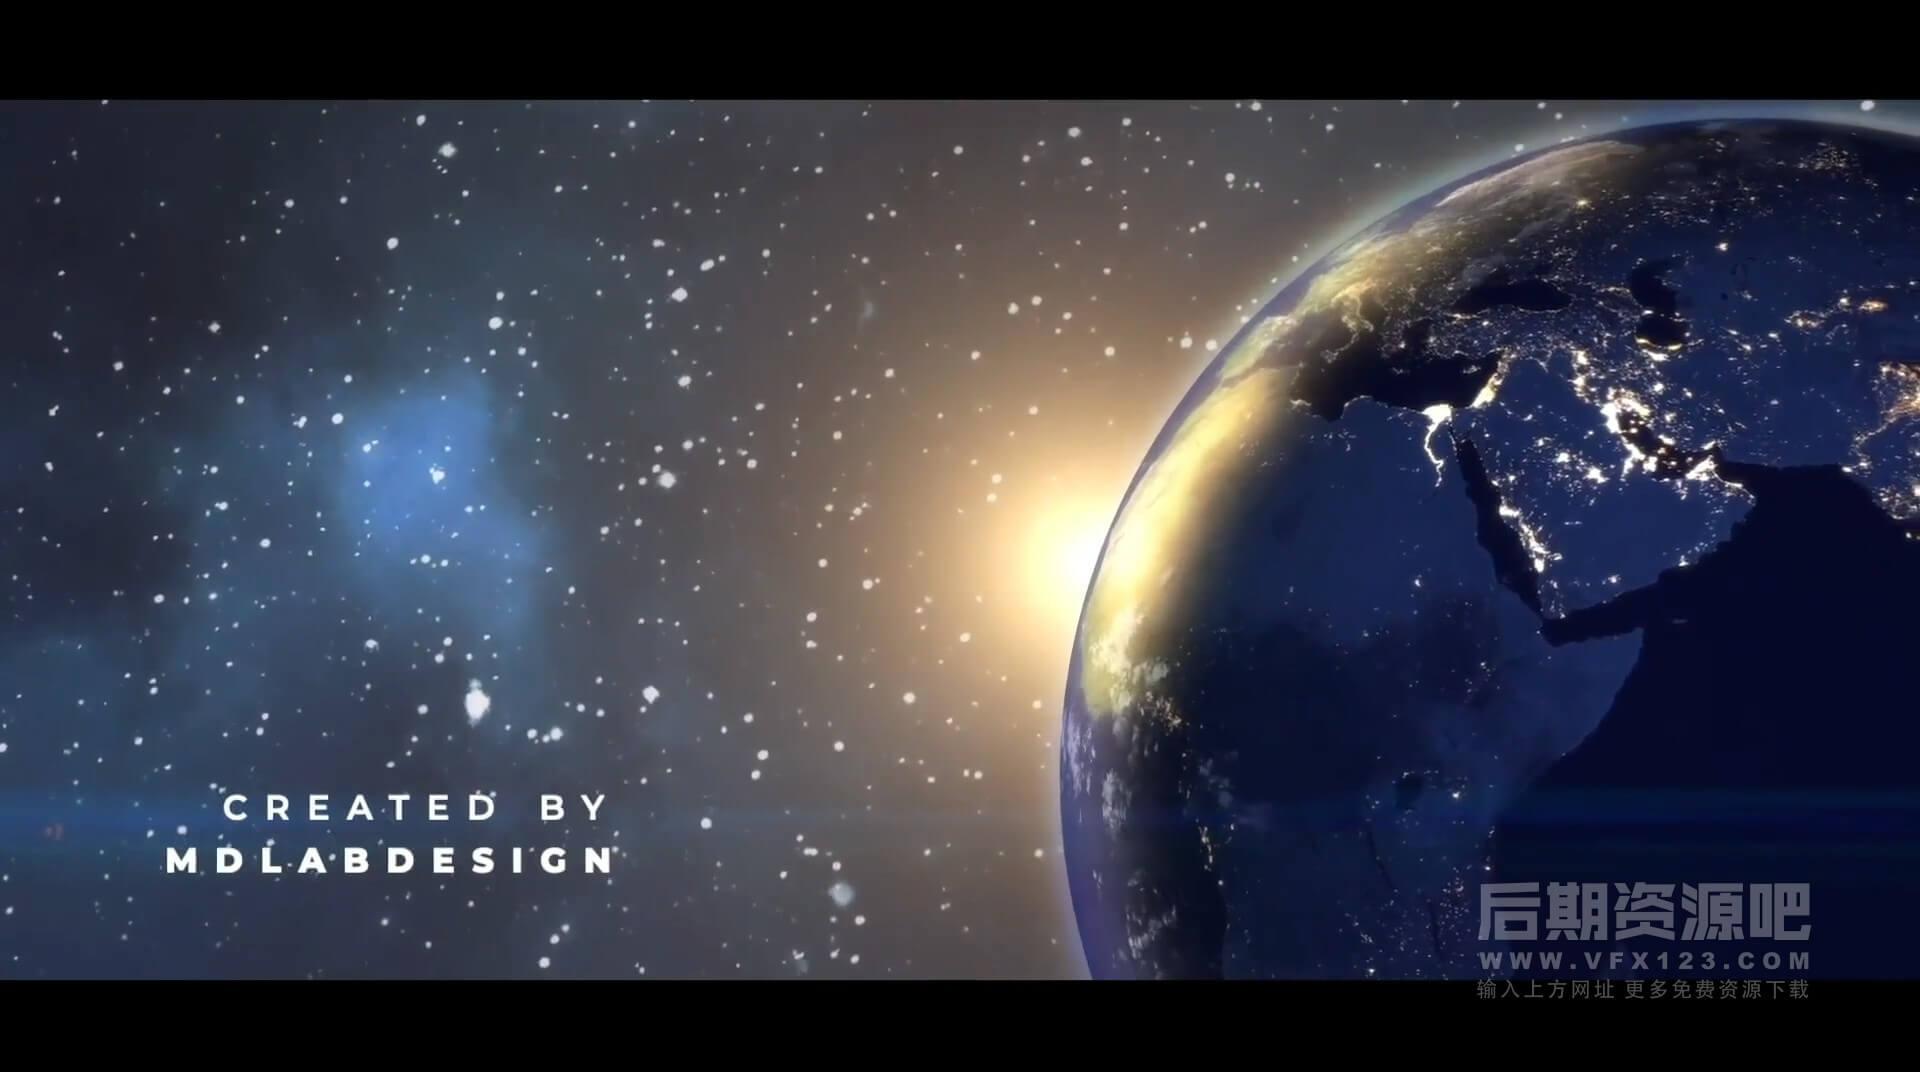 Fcpx插件 大气宇宙空间地球背景标题片头模板 Earth Planet Titles